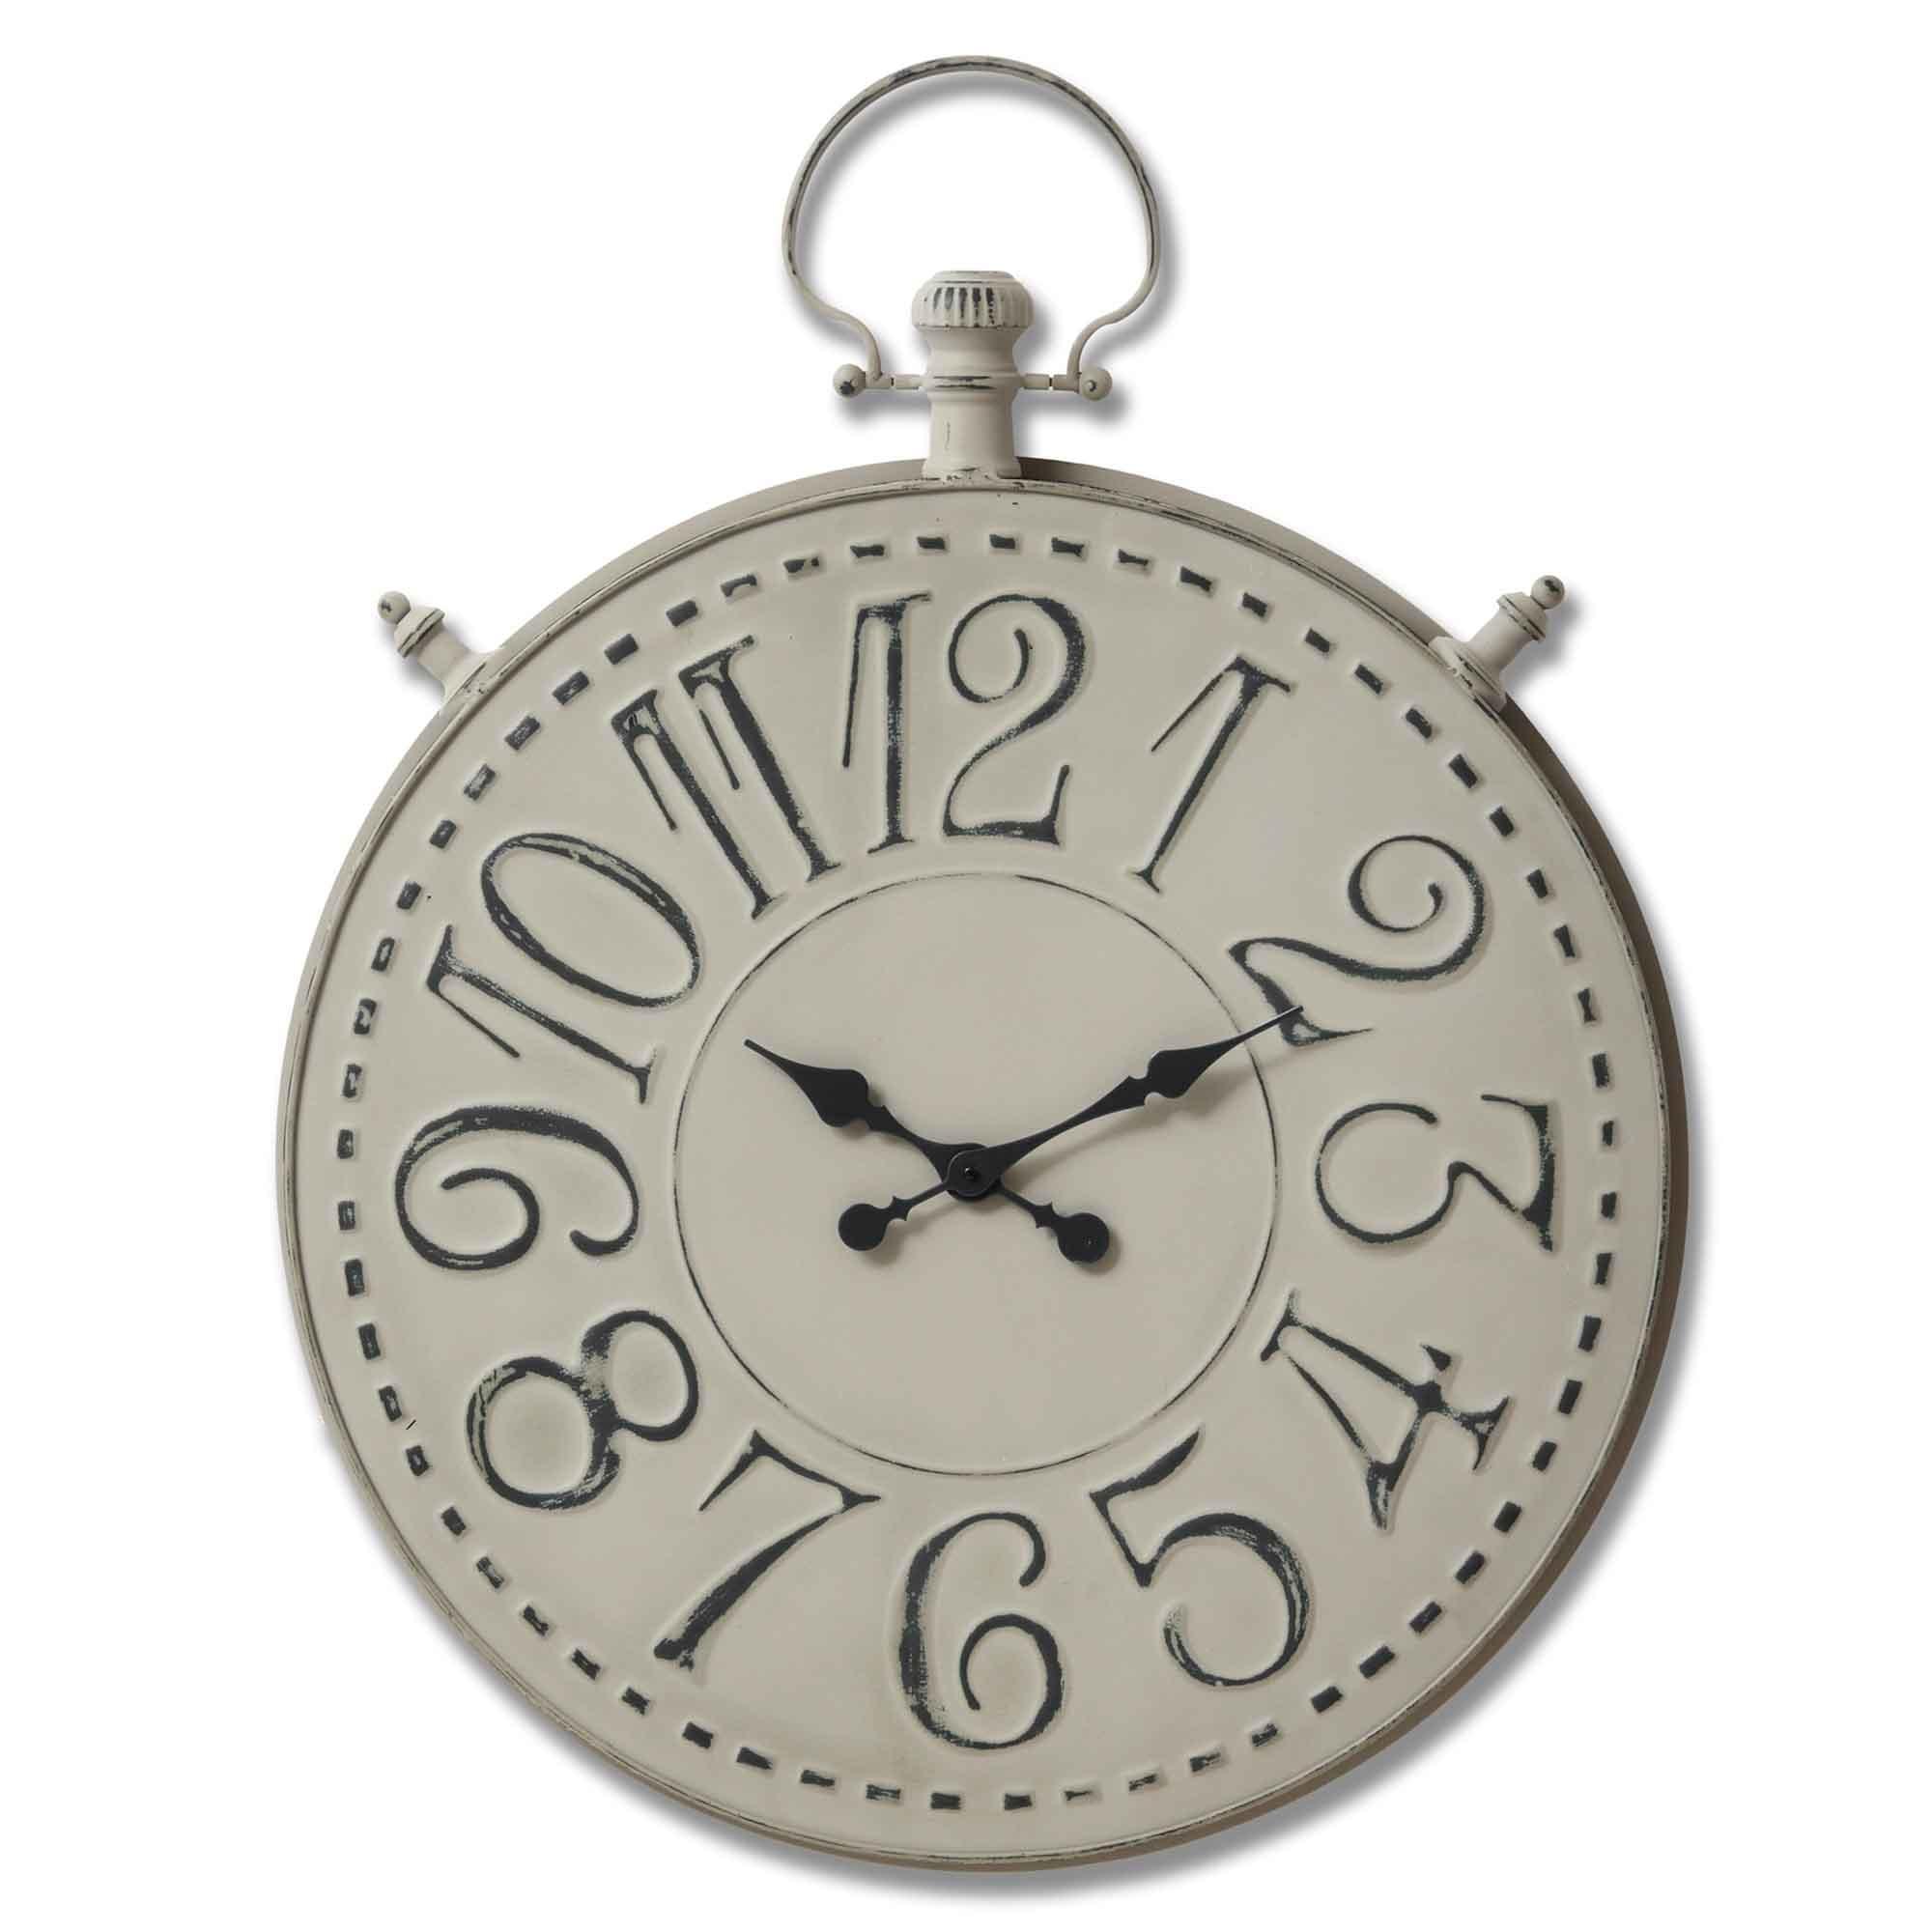 Large Grey Pocket Watch Wall Clock Clock Homesdirect365